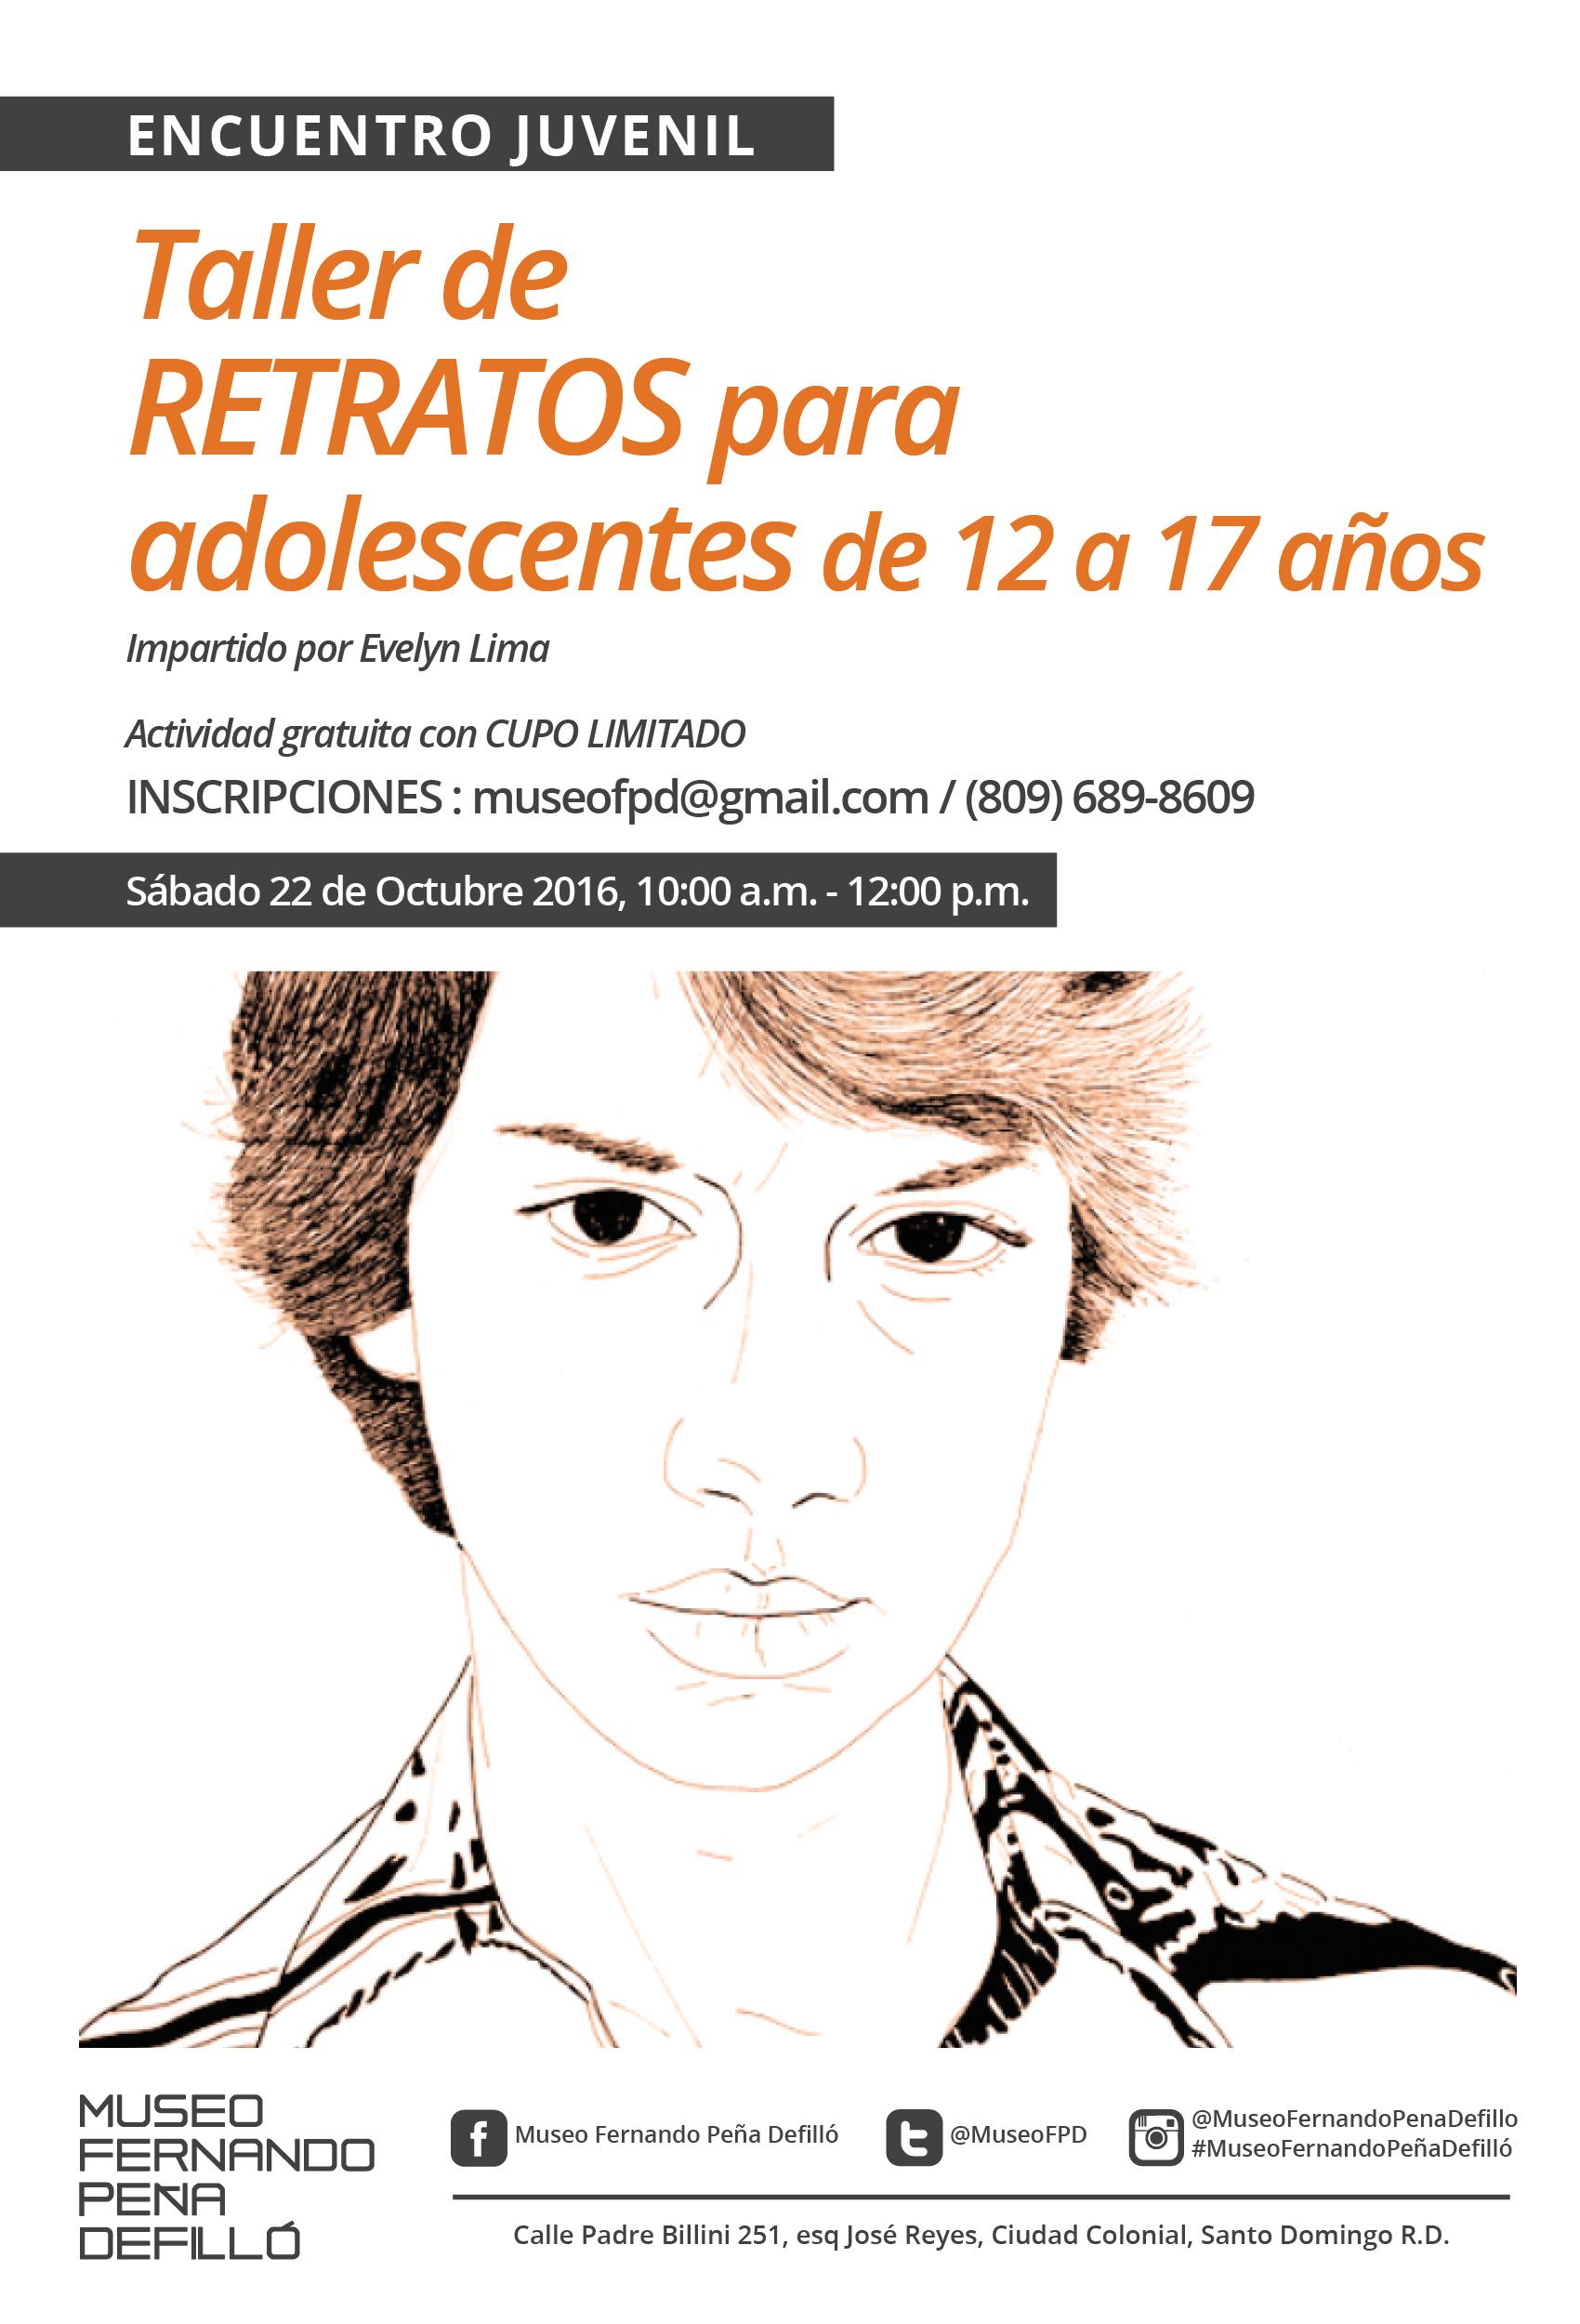 2016-10-22 Poster taller retratos juvenil .jpg